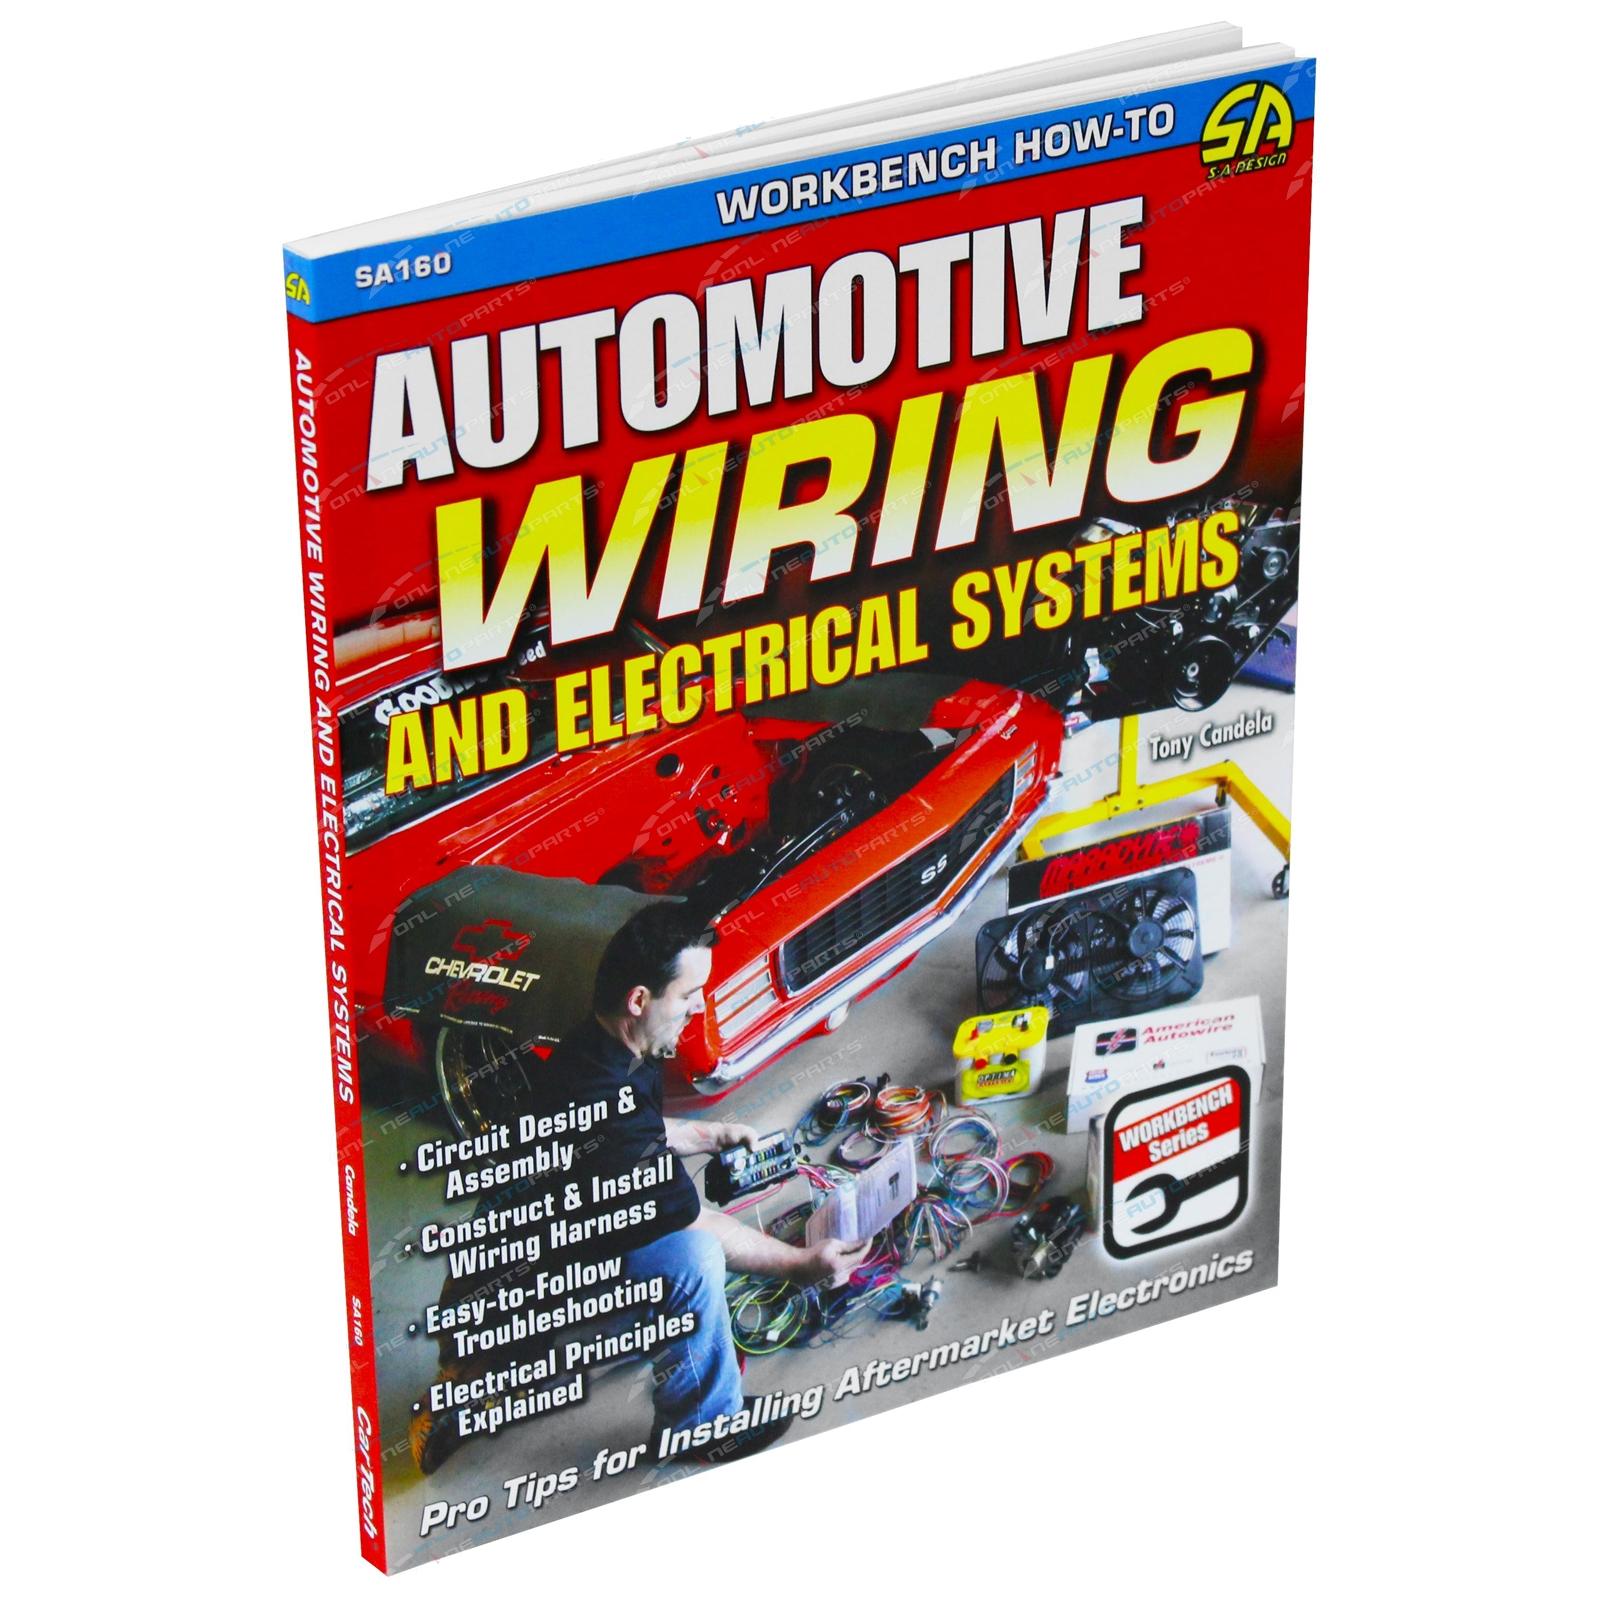 sa design cartech automotive wiring electrical systems workshop rh onlineautoparts com au Automotive Wiring Harness Suppliers Automotive Wire Harness Manufacturers USA